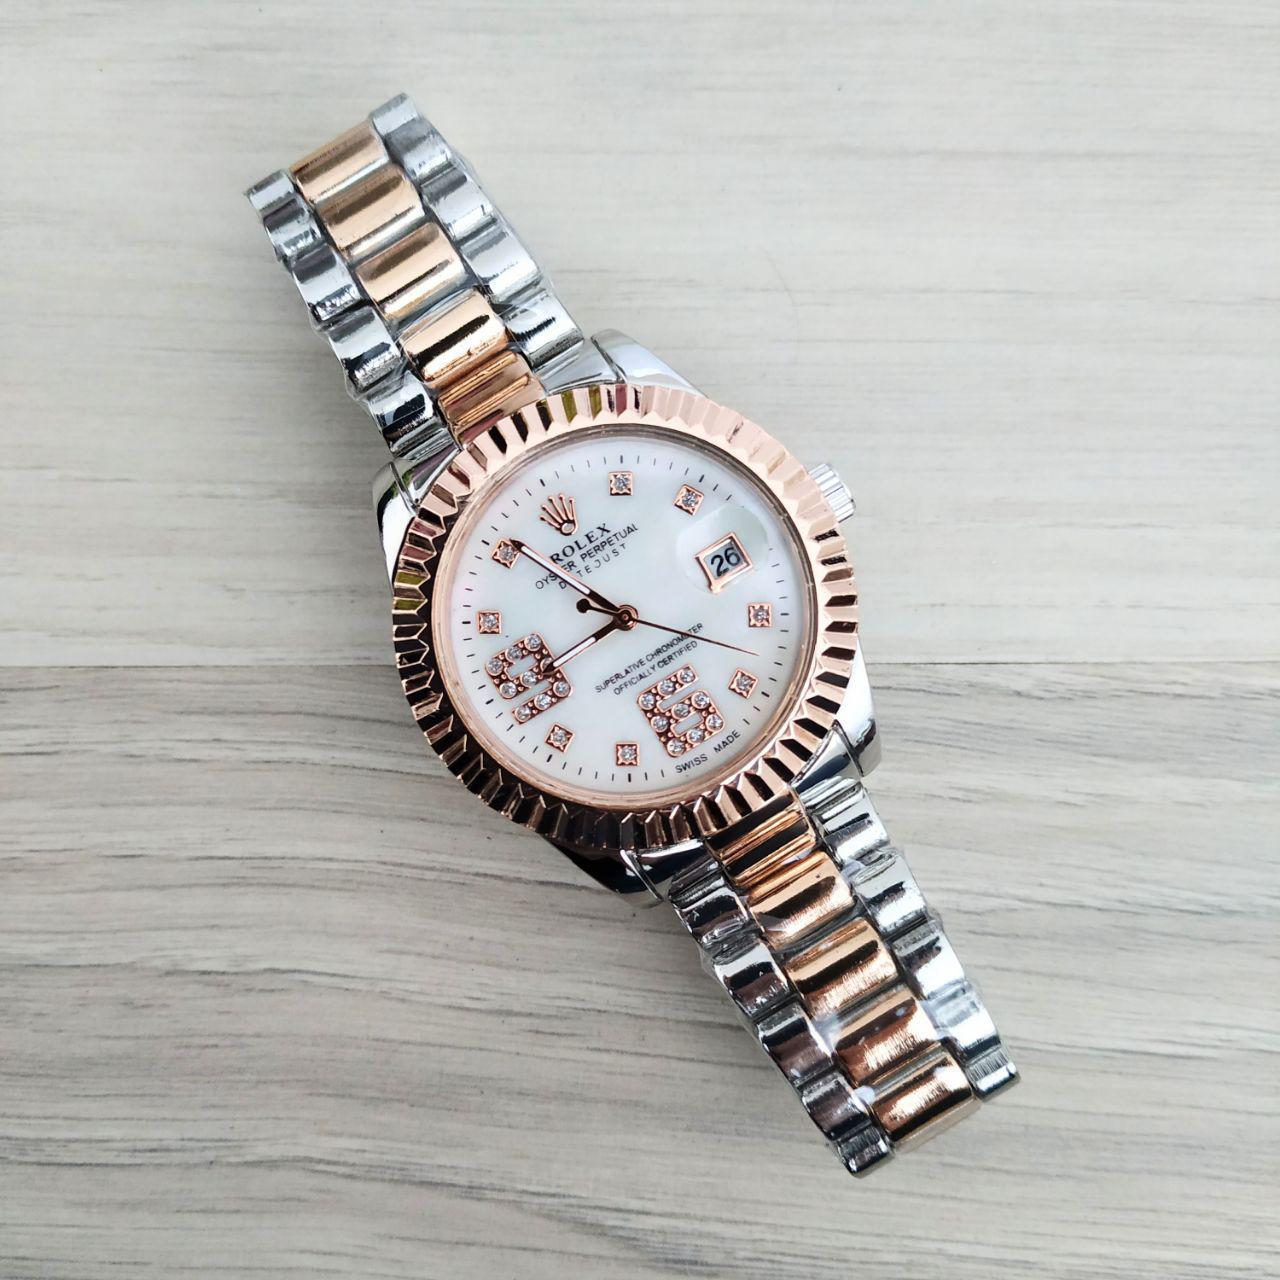 Rolex SKPAN-1020-0777